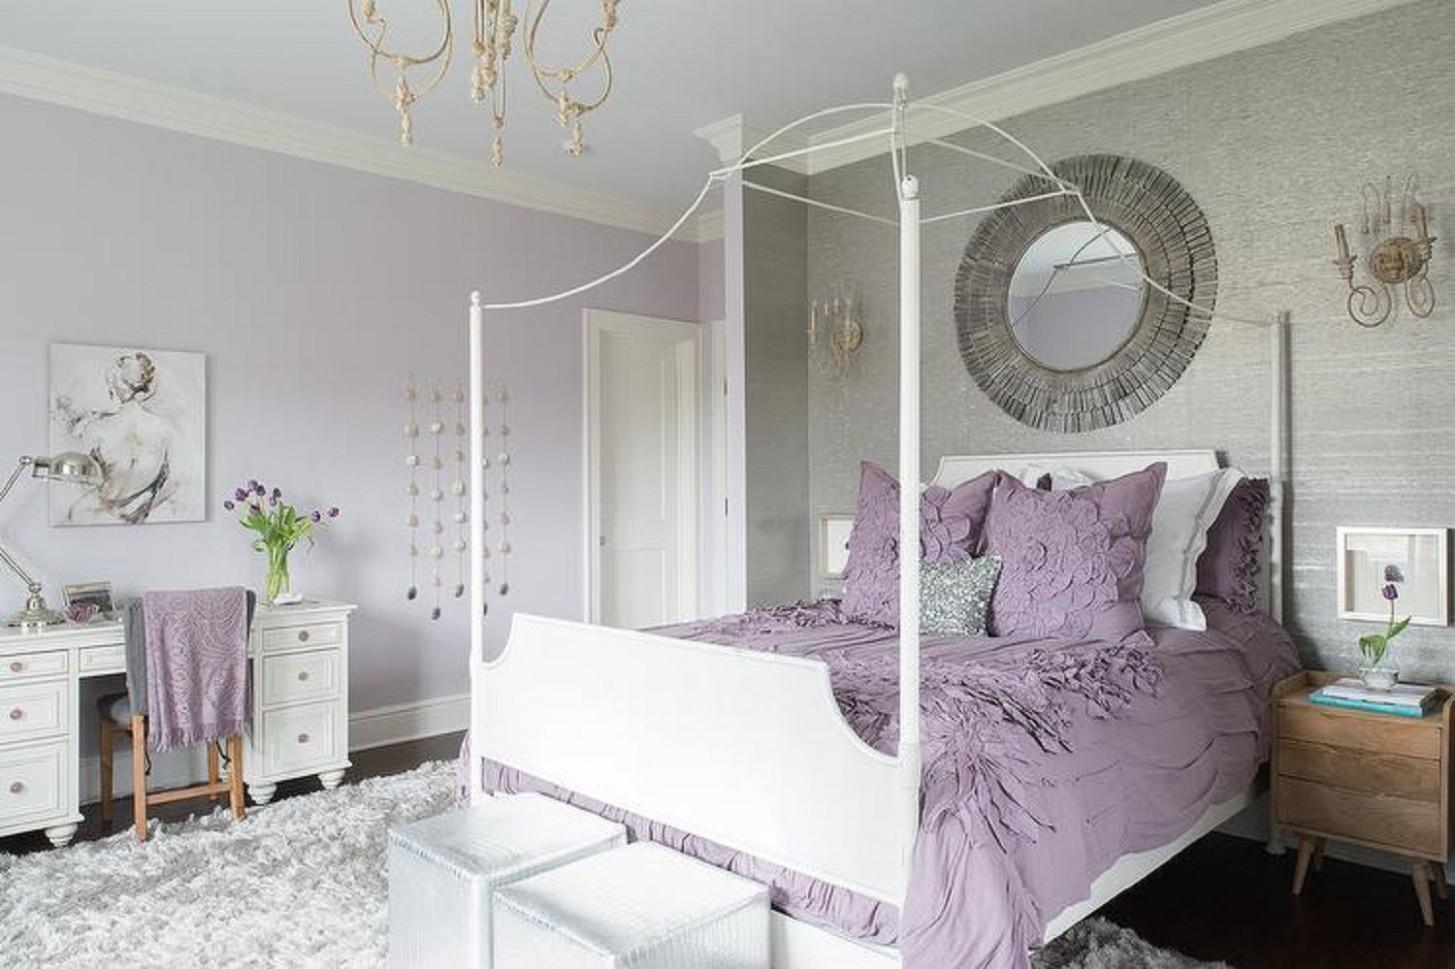 Purple Bedrooms Tips and Decorating Ideas - Bedroom Ideas Purple